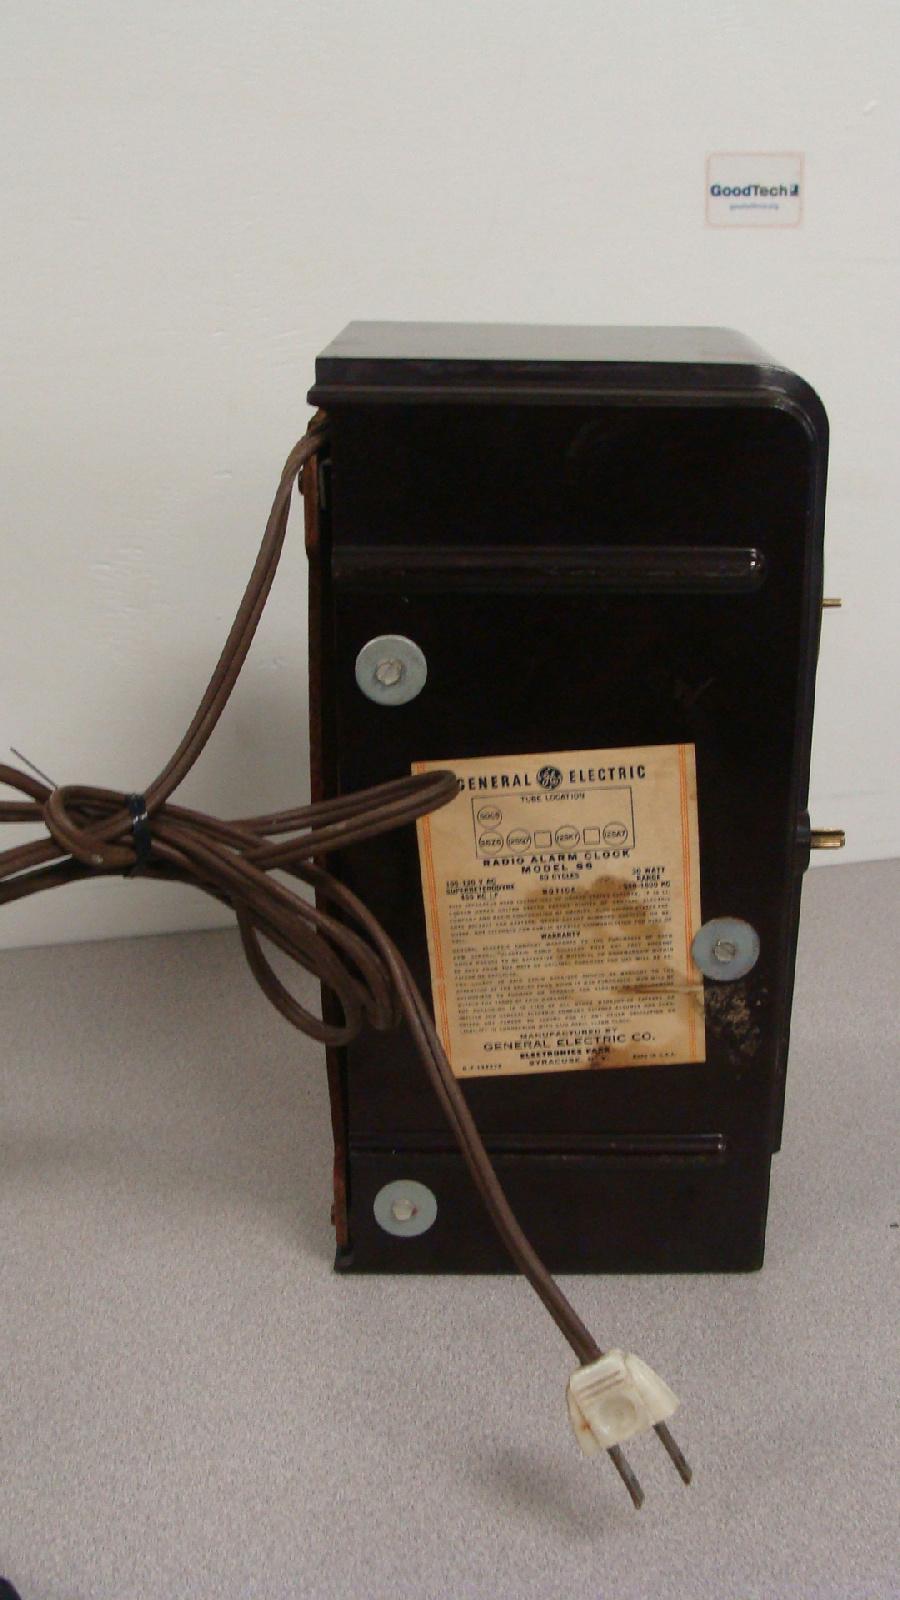 Vintage Radios, Vintage Audio & Video, Vintage - PicClick